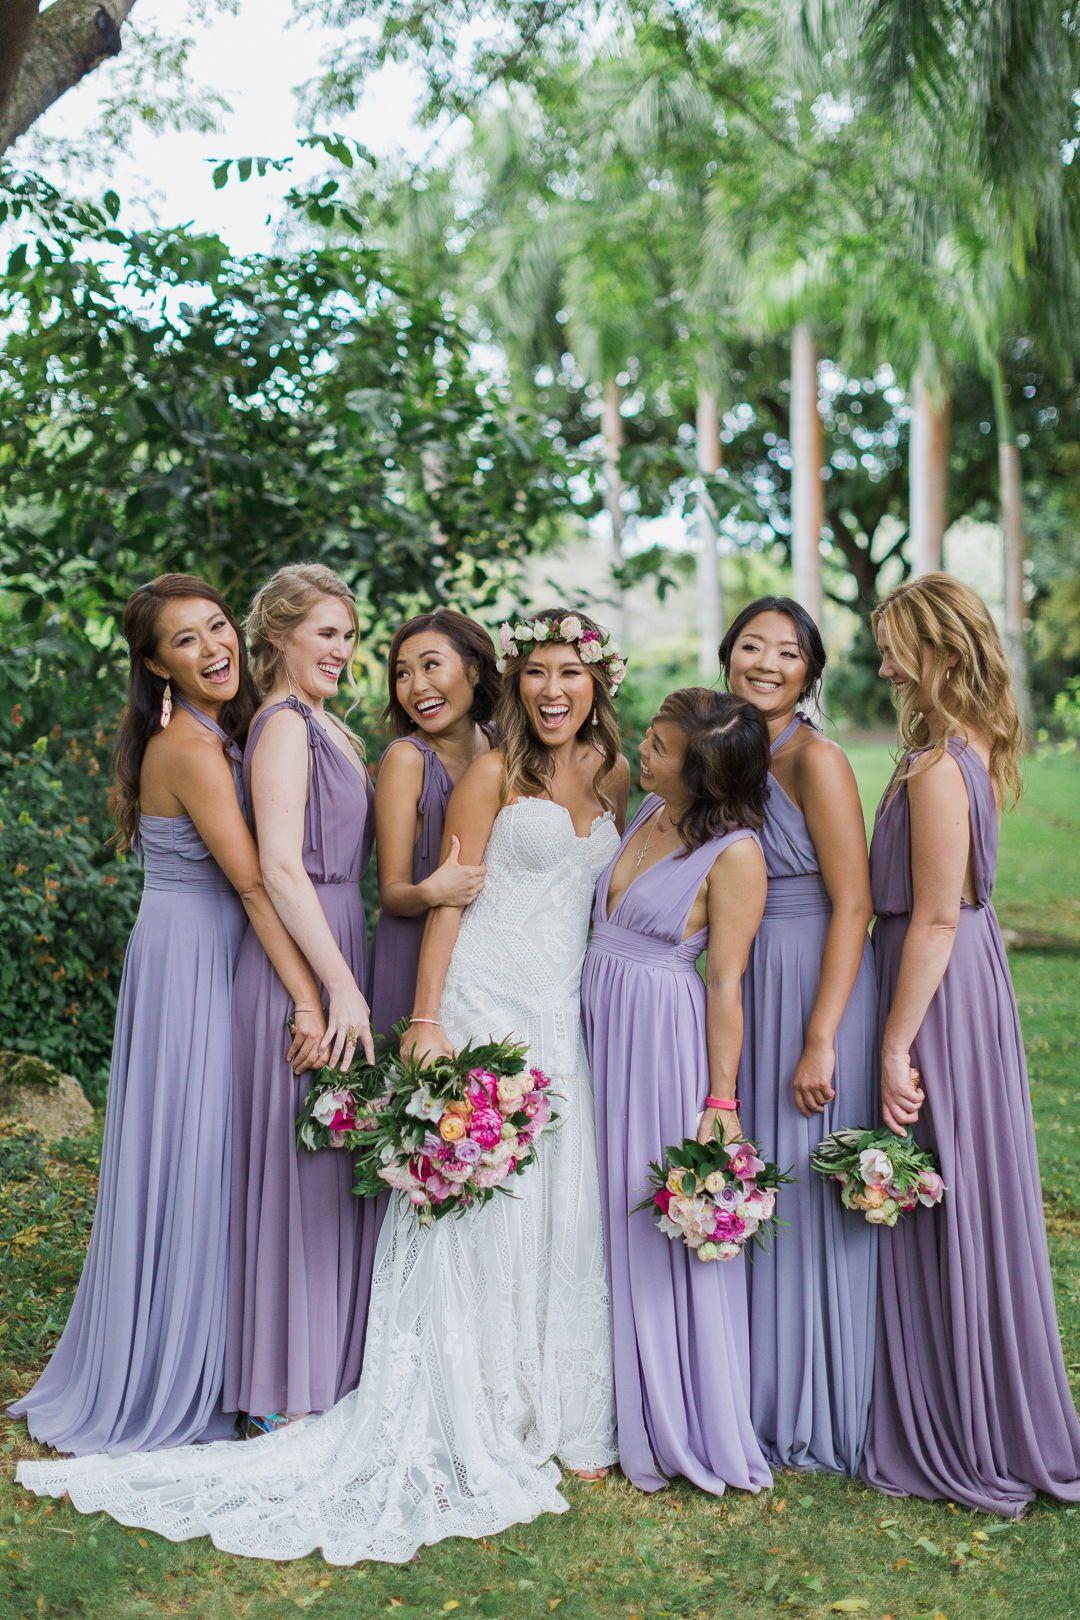 Purple Adorned Bridesmaids At Na Aina Kai Botanical Gardens Kauai Purple Wedding Dress Bridesmaid Garden Wedding Bridesmaids Light Purple Bridesmaid Dresses [ 1620 x 1080 Pixel ]